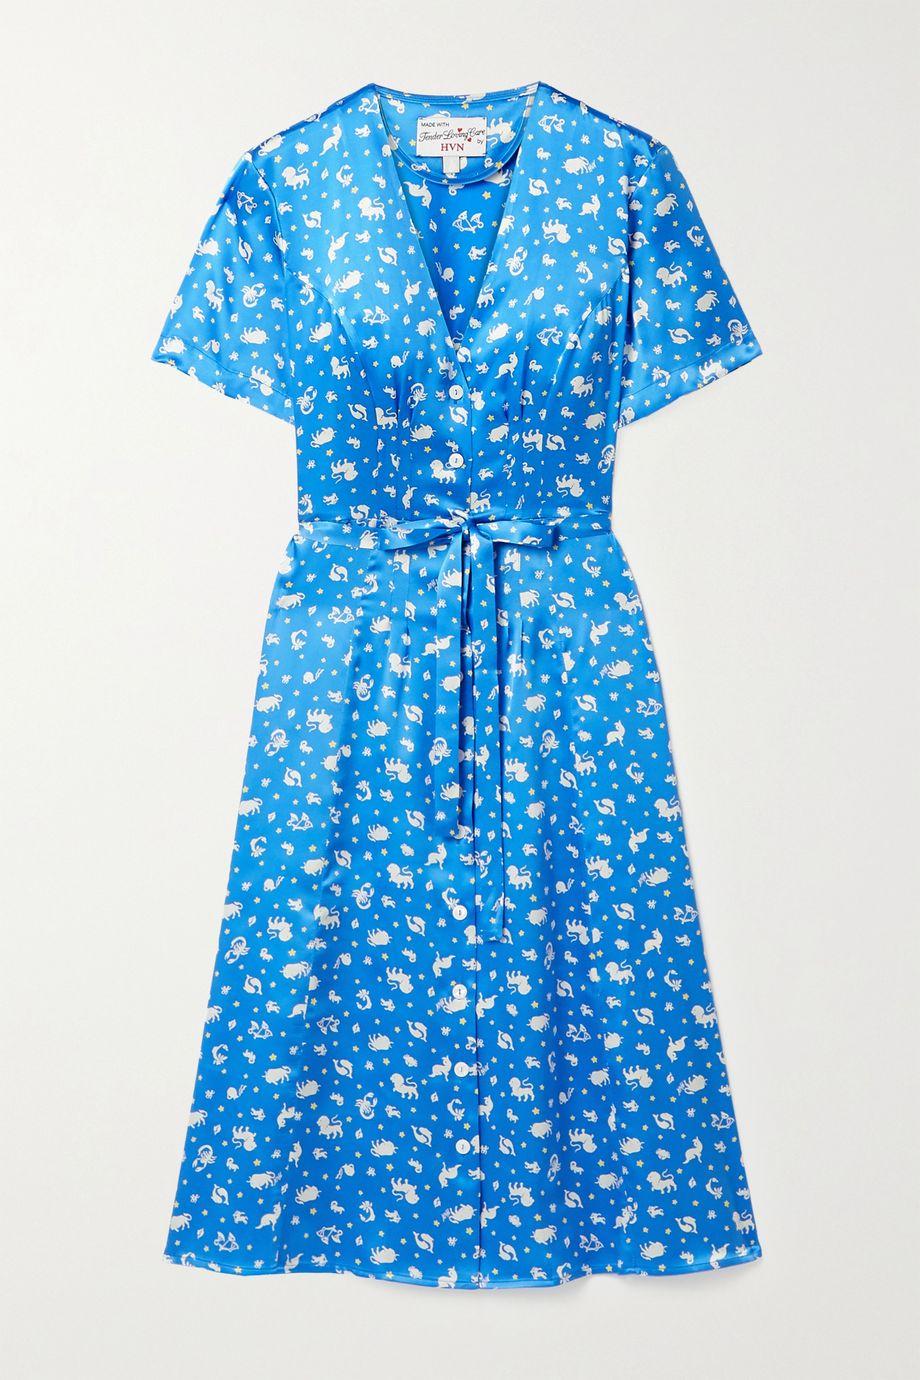 HVN Rosemary belted printed silk-satin dress